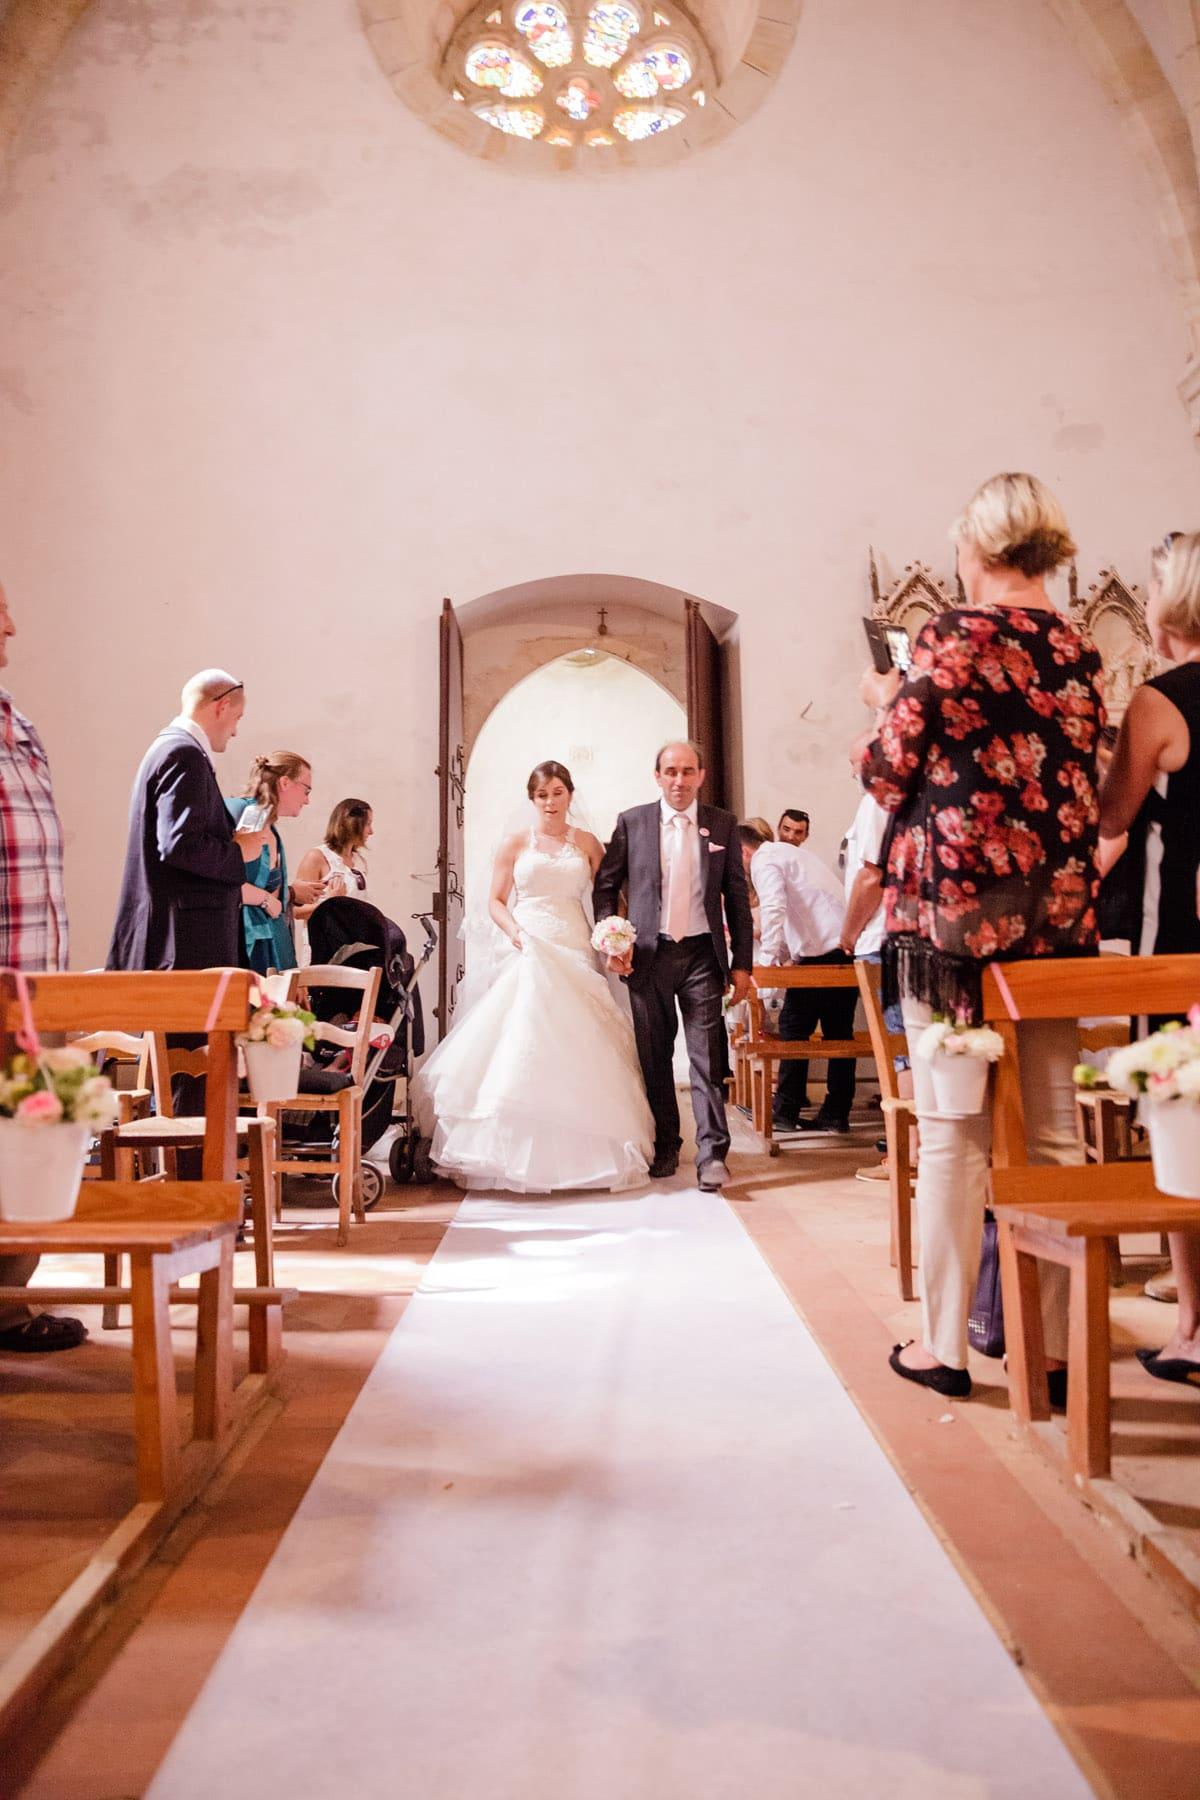 photographe mariage bordeaux landes fineart francais sarah miramon blog 11